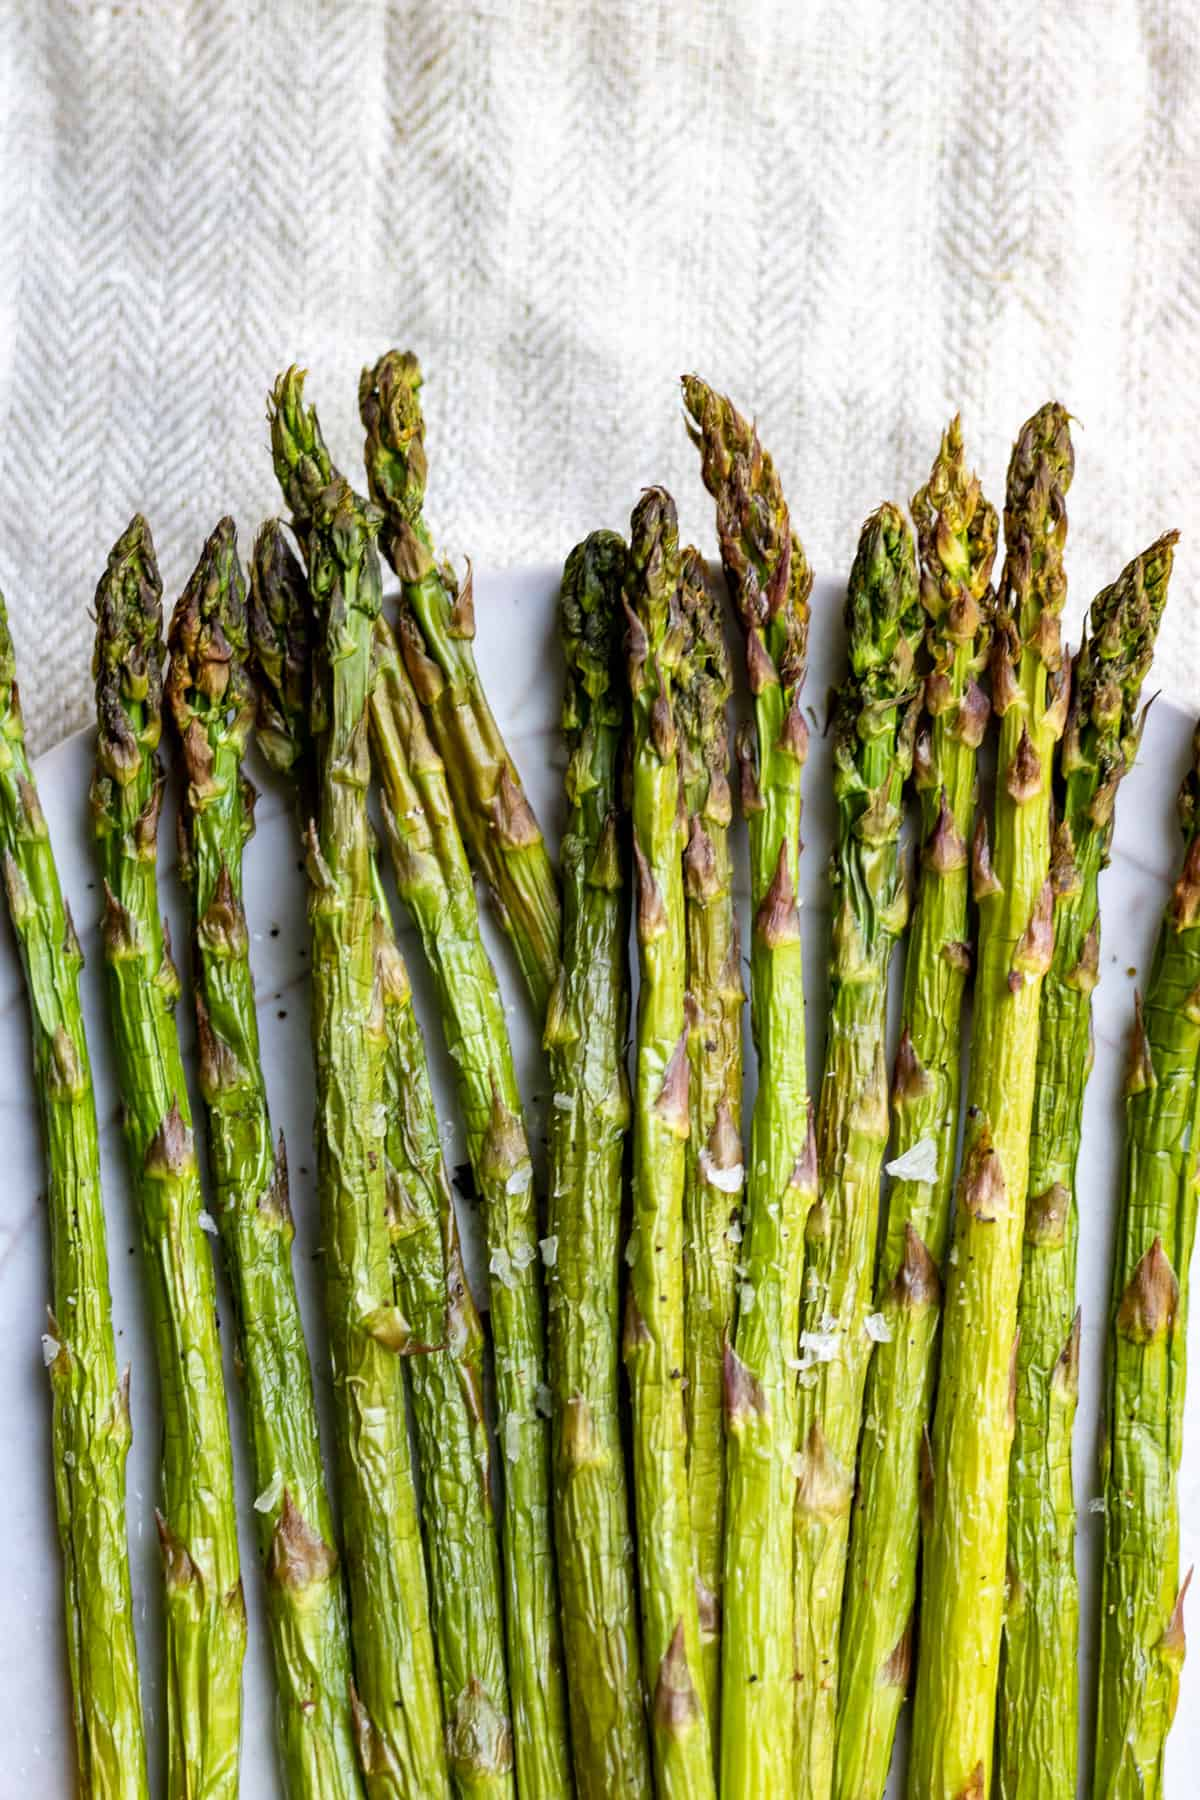 Rows of roasted asparagus.